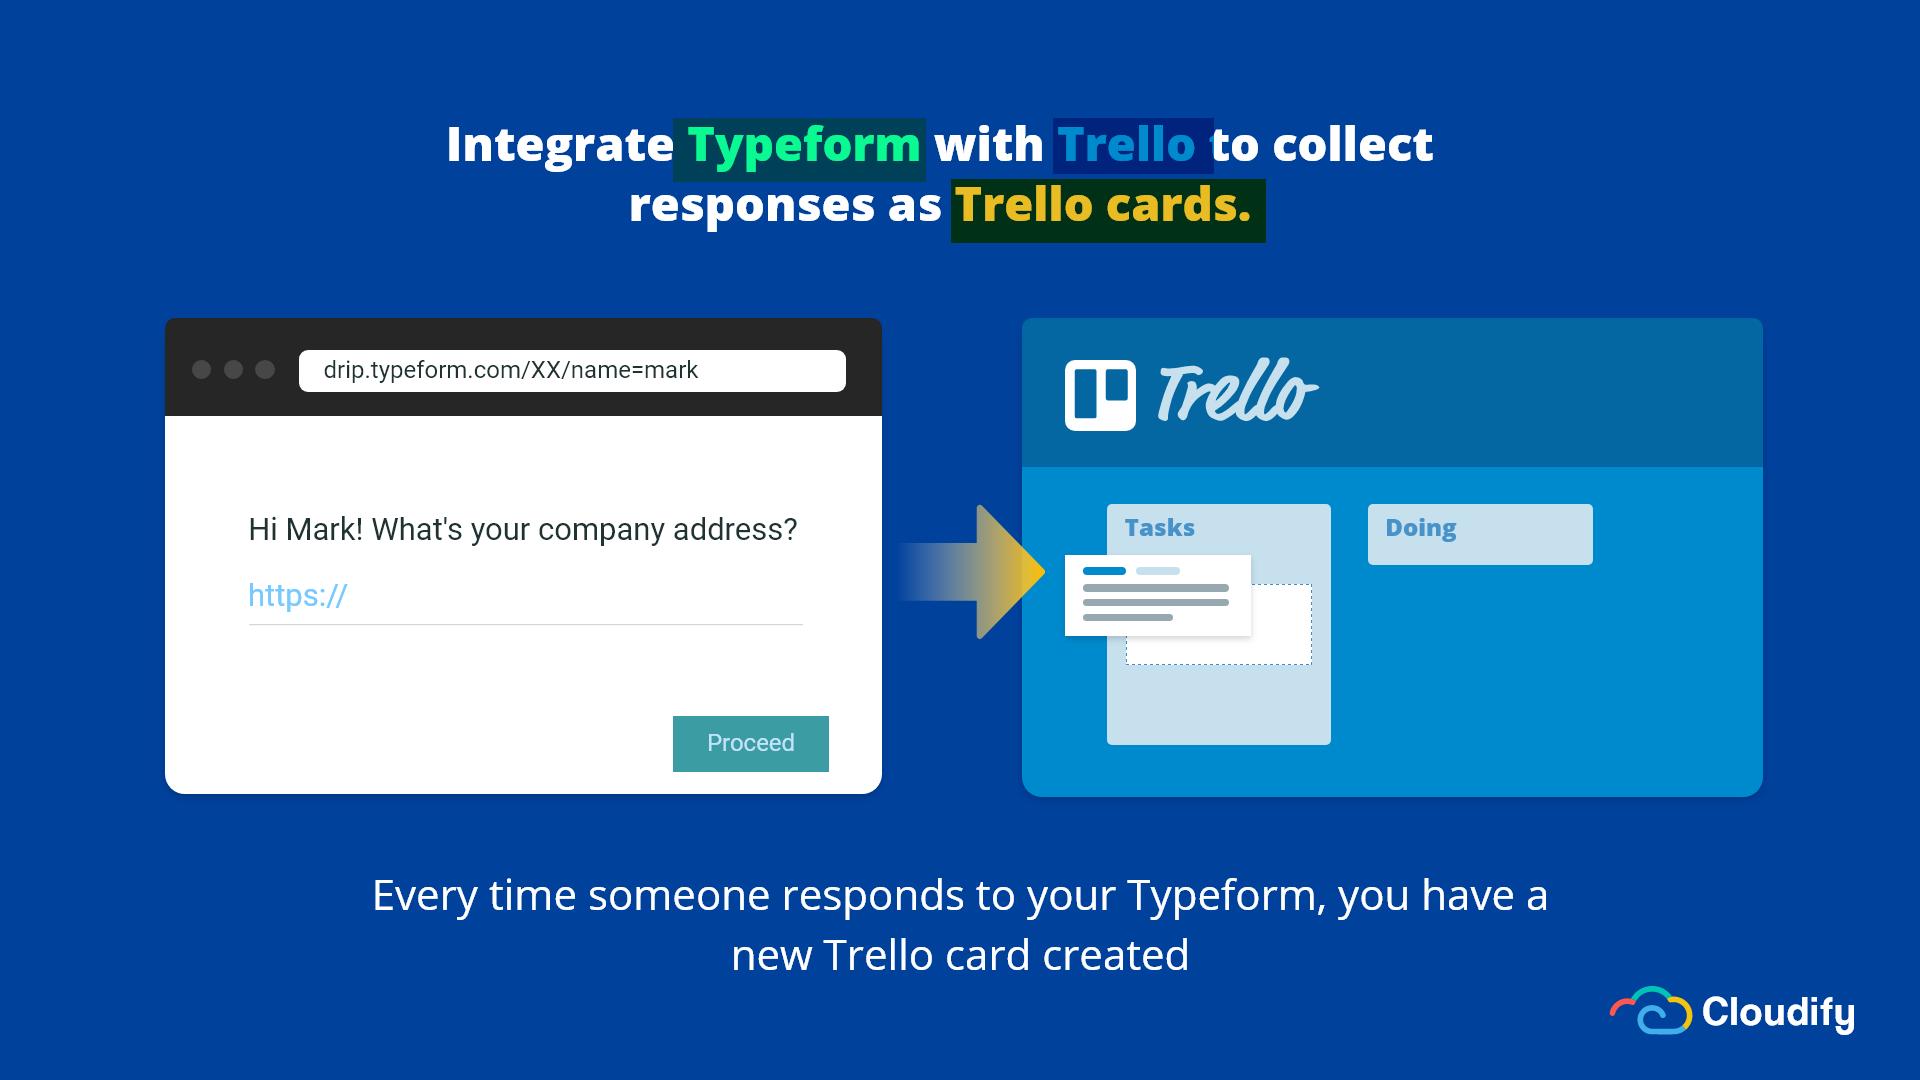 Typeform Trello Integration